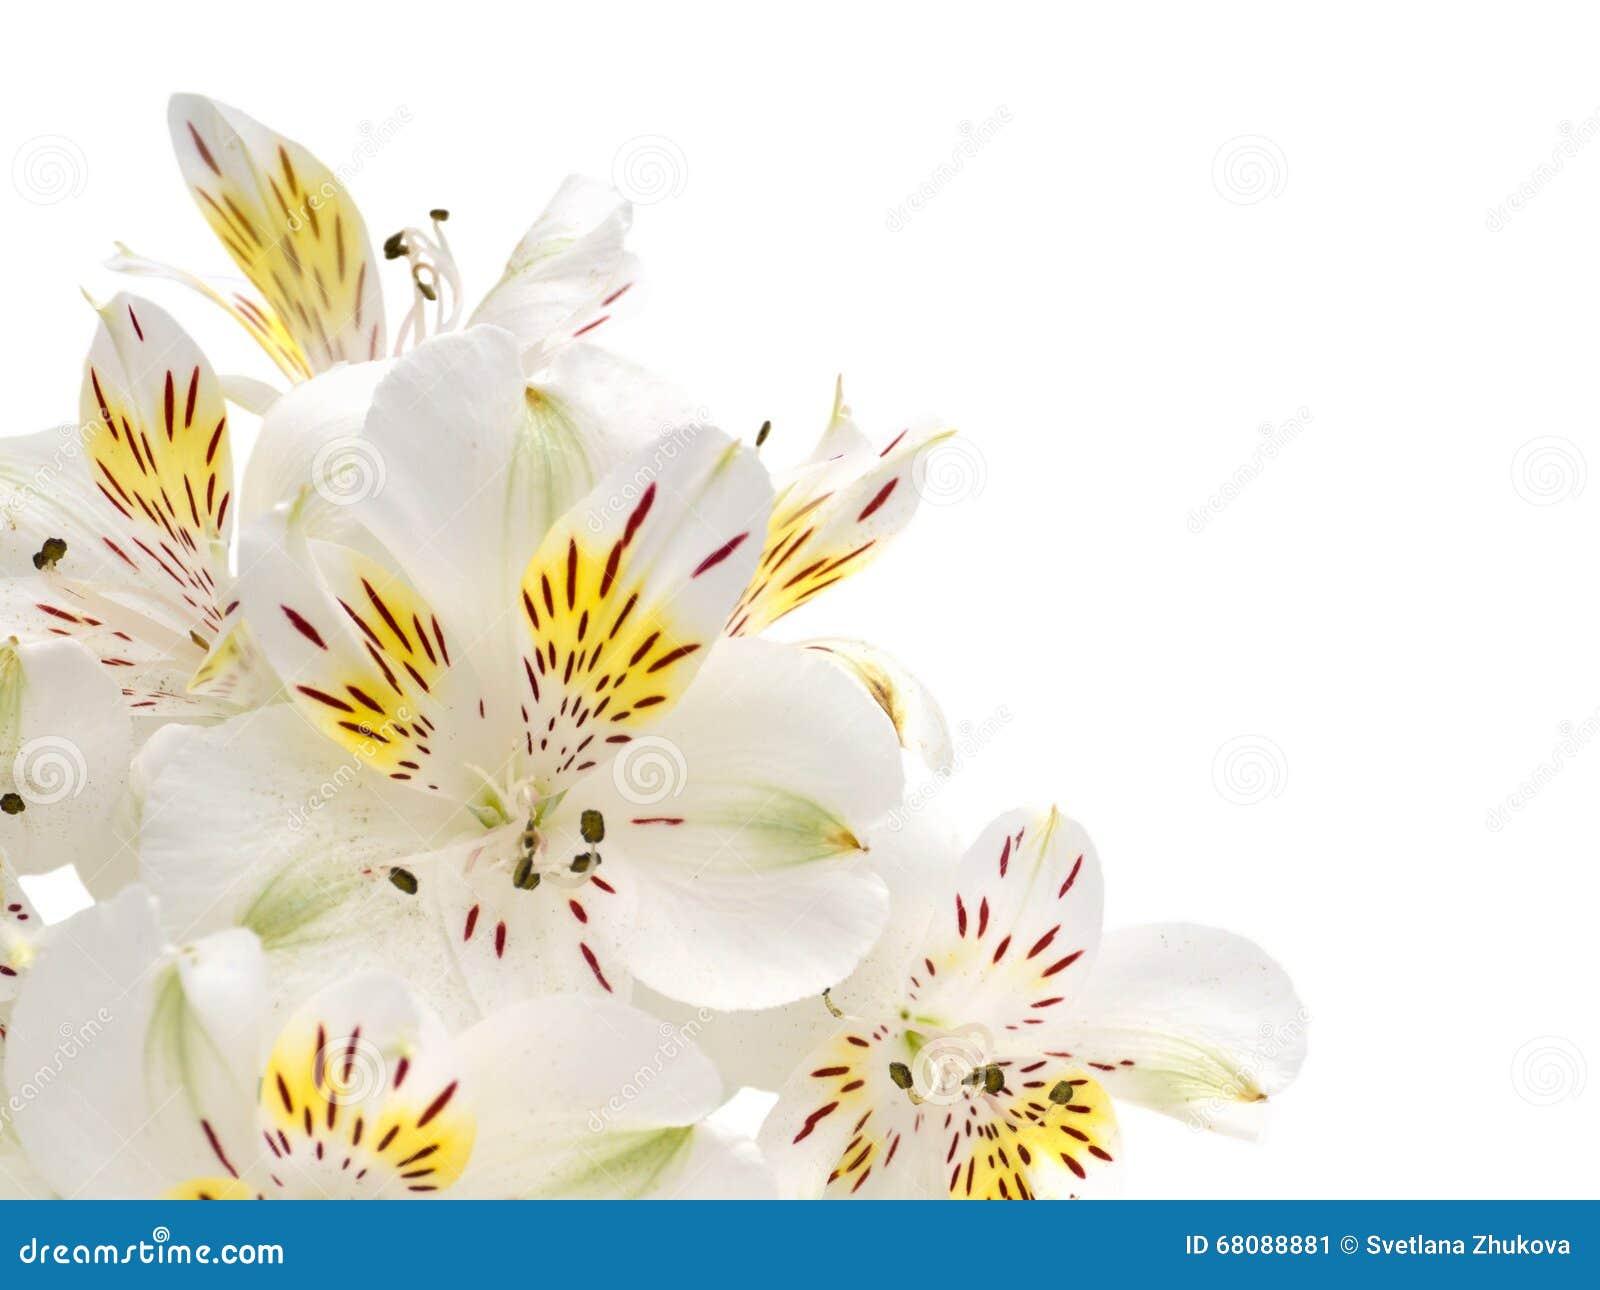 White alstroemeria flowers stock image image of delicate 68088881 white alstroemeria flowers mightylinksfo